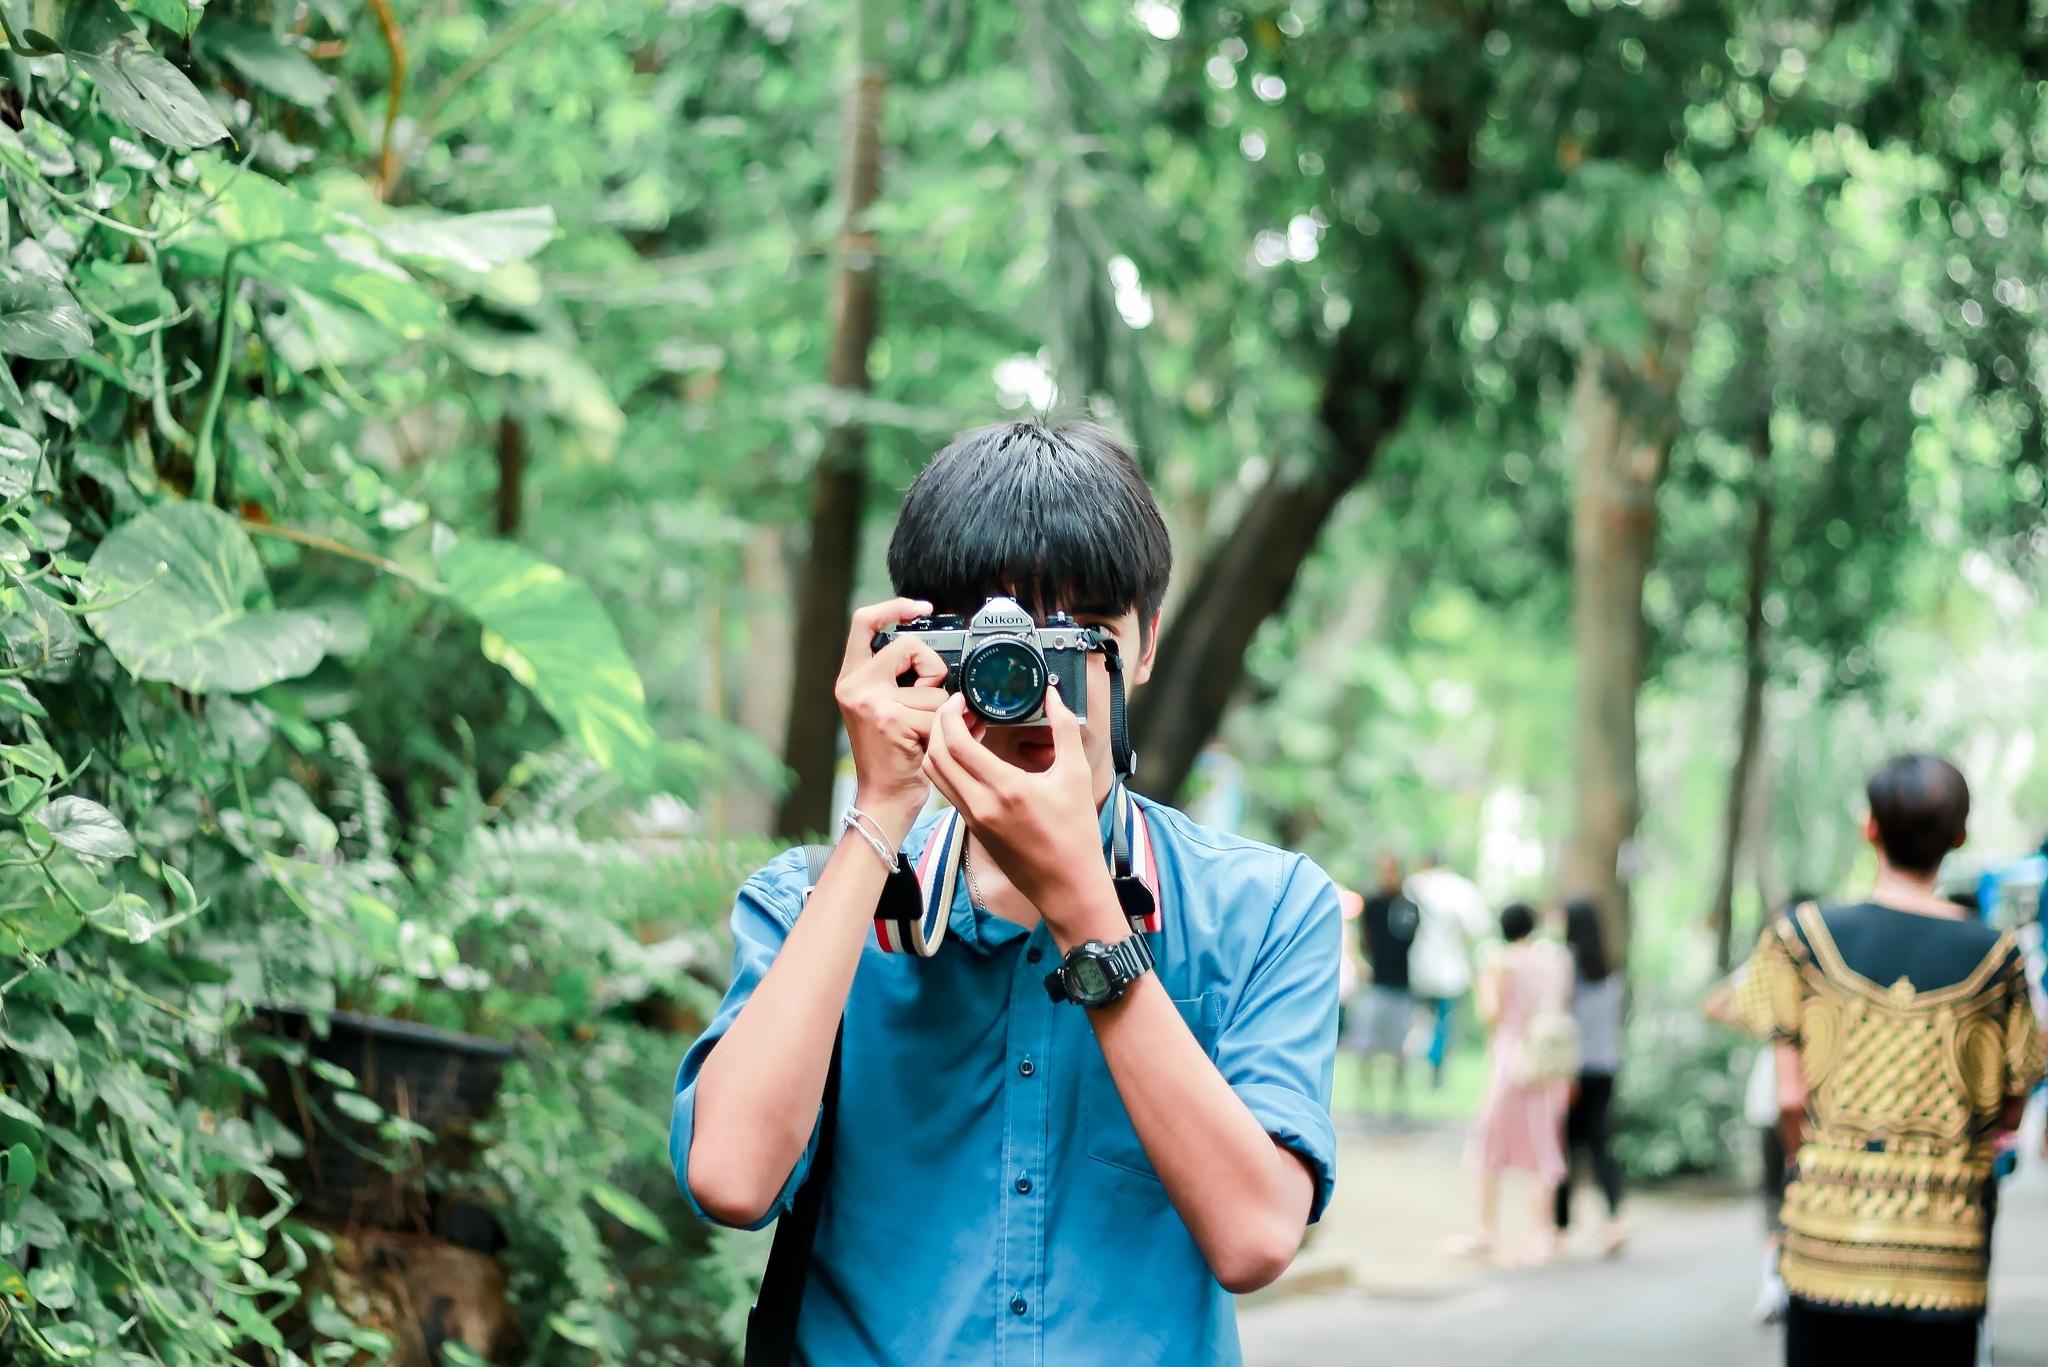 Go to Thitipark Sodchuen's profile